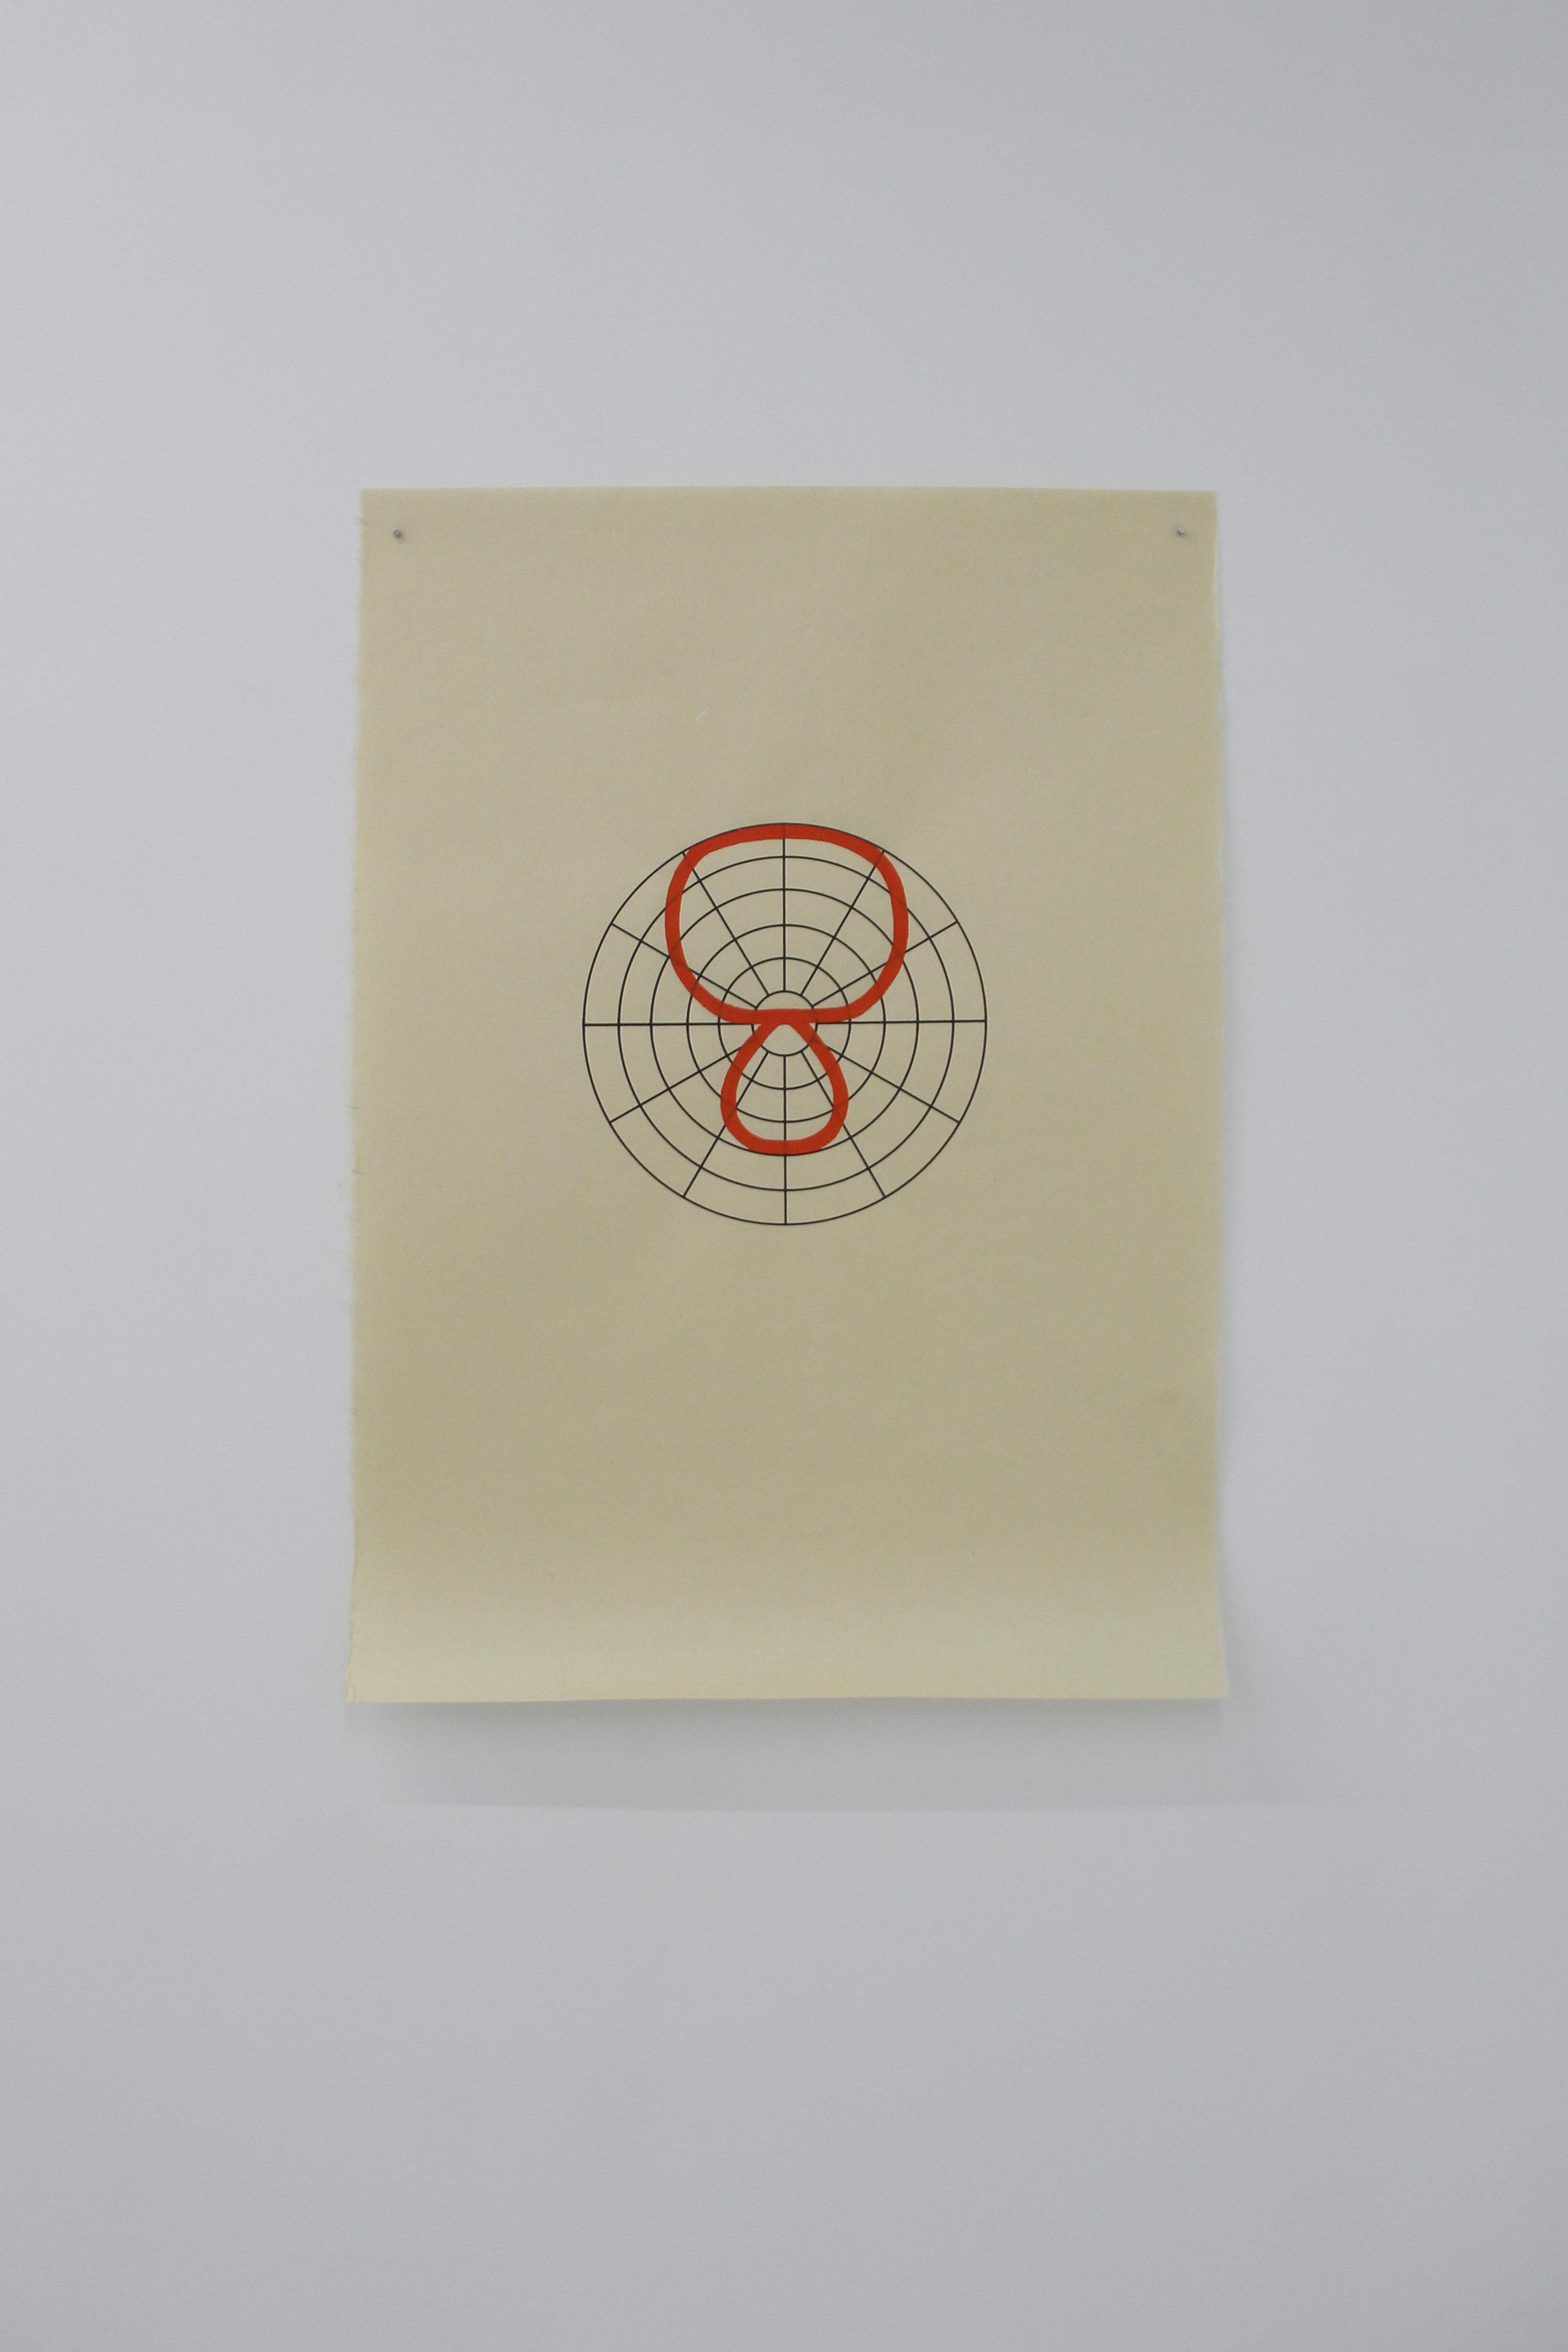 Antonin Gerson,  Orange - Hypercardioïde,  Sérigraphie, gouache, 58x84cm, 2018